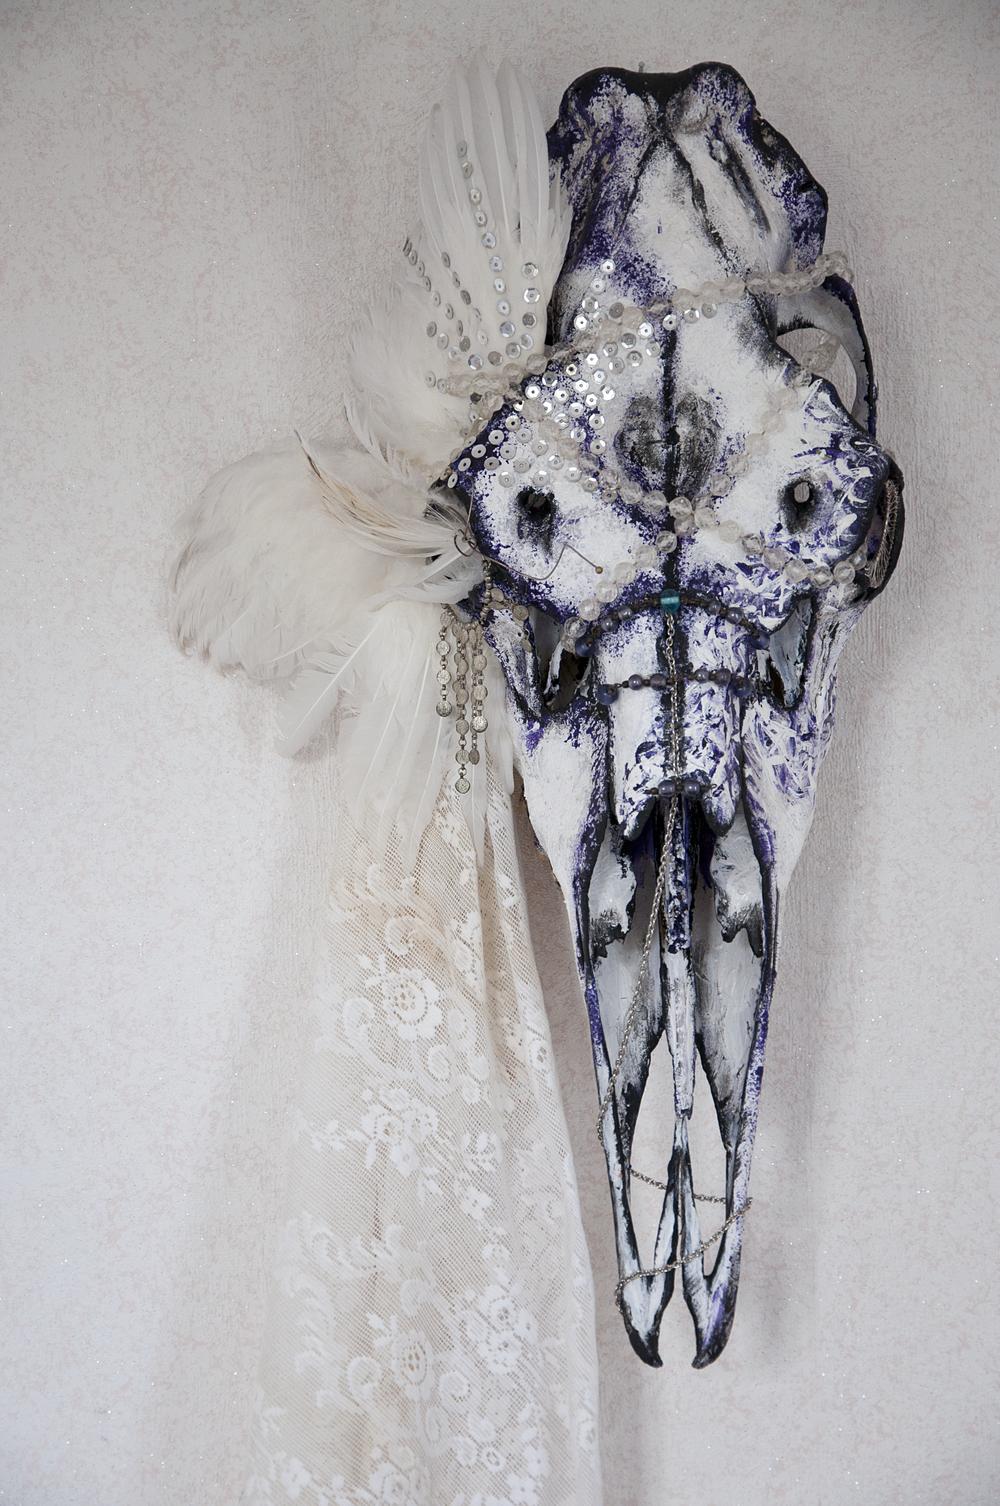 petra-shara-stoor-skull-art-dheluleaa-1.png